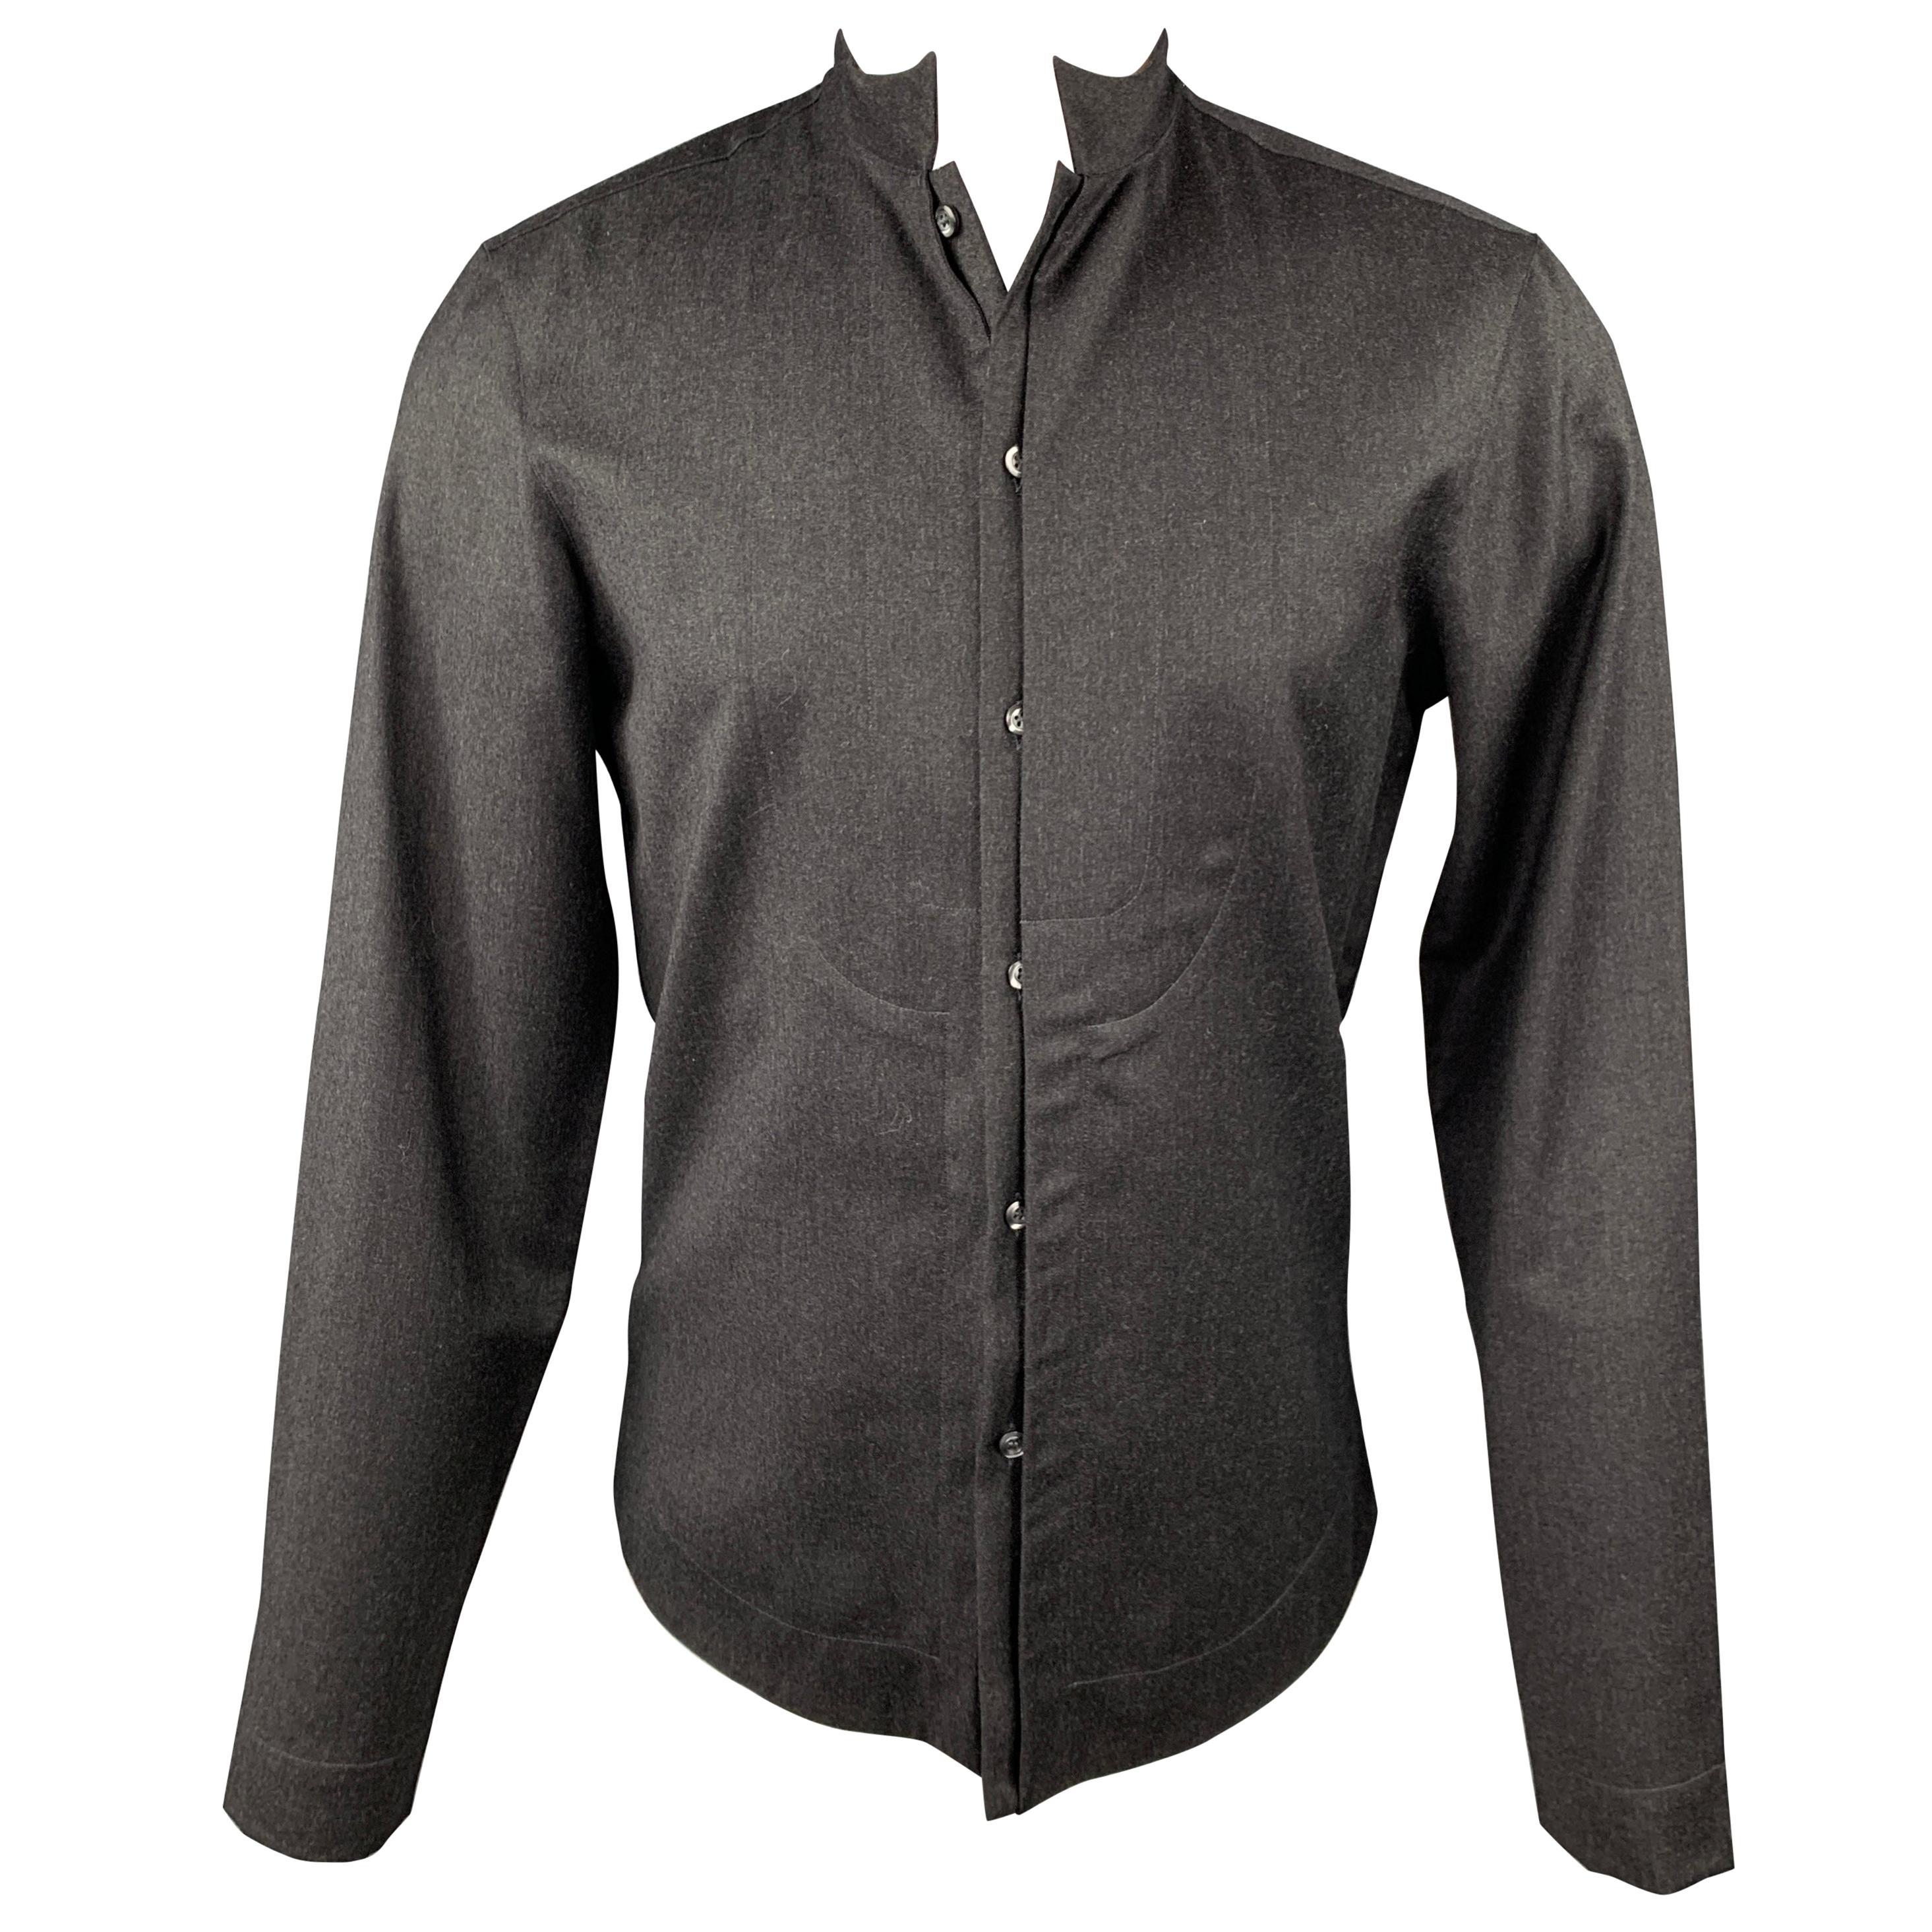 EMPORIO ARMANI Size S Charcoal Wool Hidden Buttons Long Sleeve Shirt